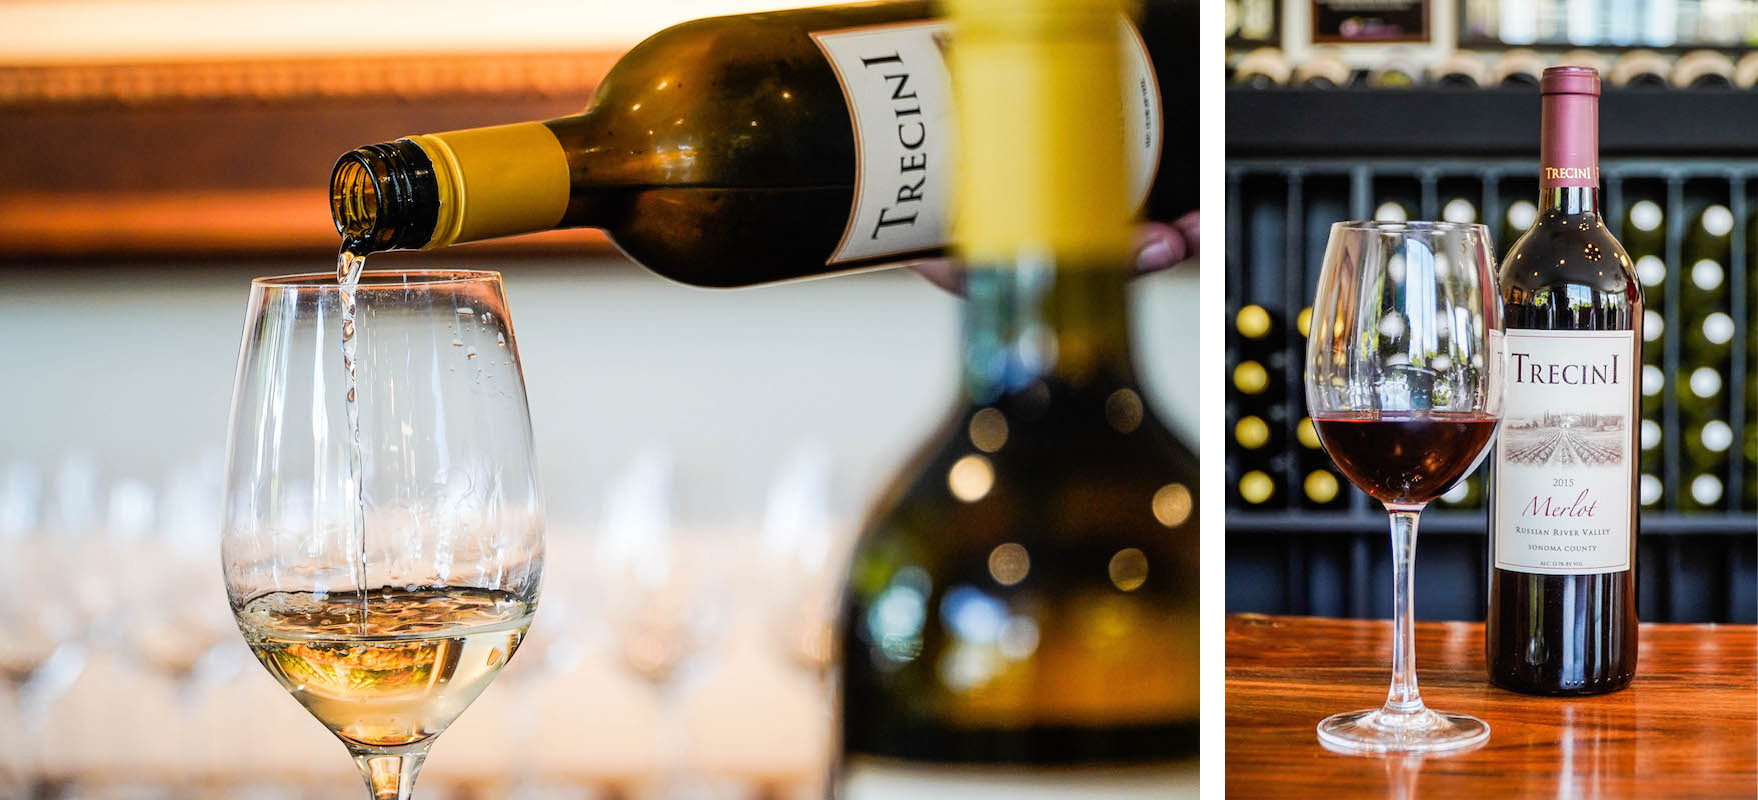 Trecini Winery